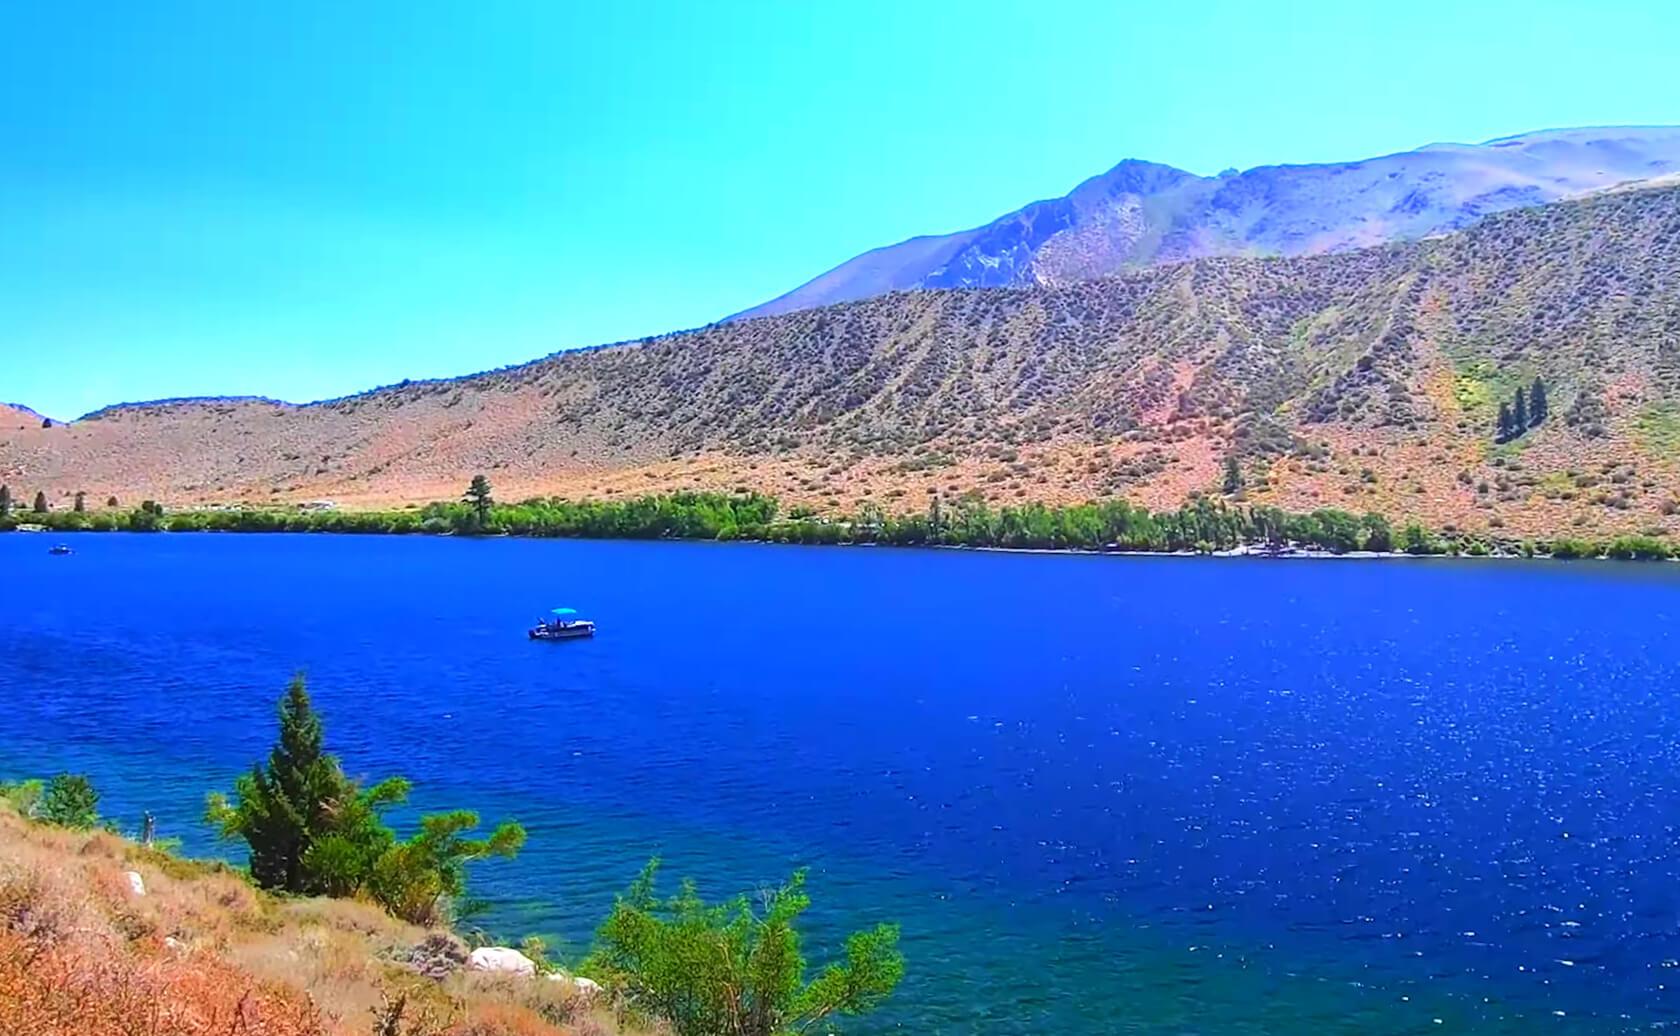 Convict-Lake-Reservoir-Fishing-Guide-Report-California-05